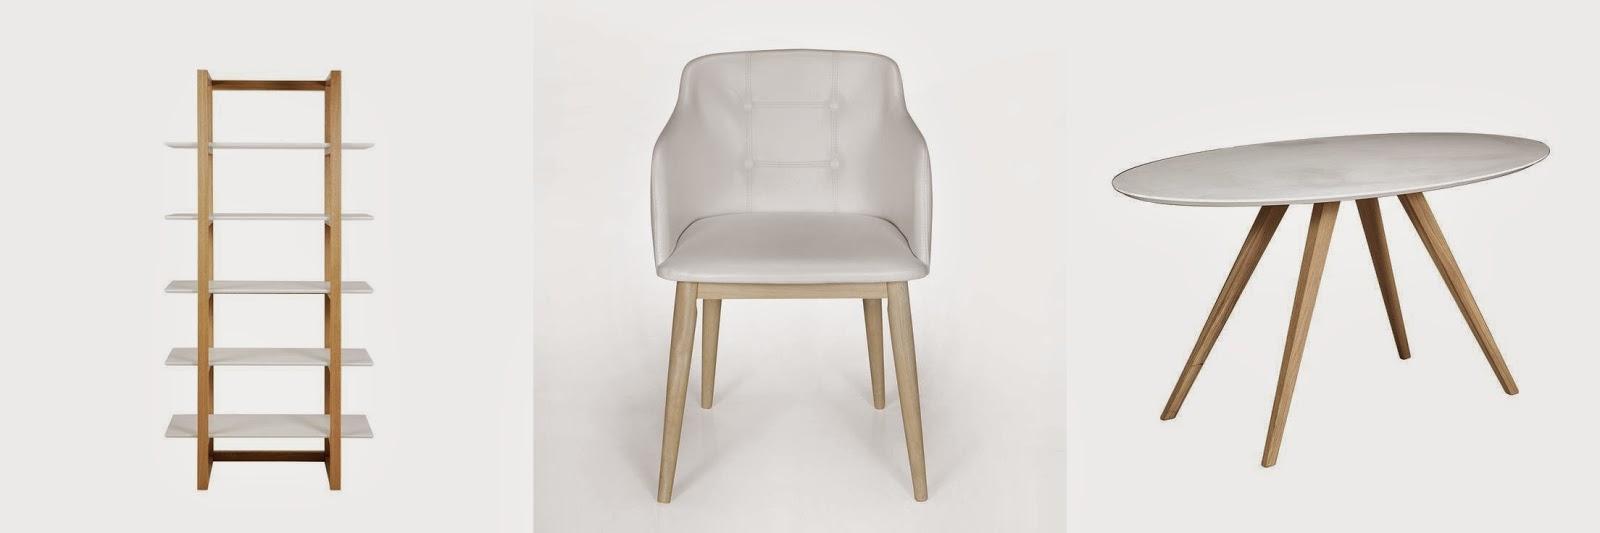 l 39 esprit scandinave chez alin a bull 39 elodie. Black Bedroom Furniture Sets. Home Design Ideas